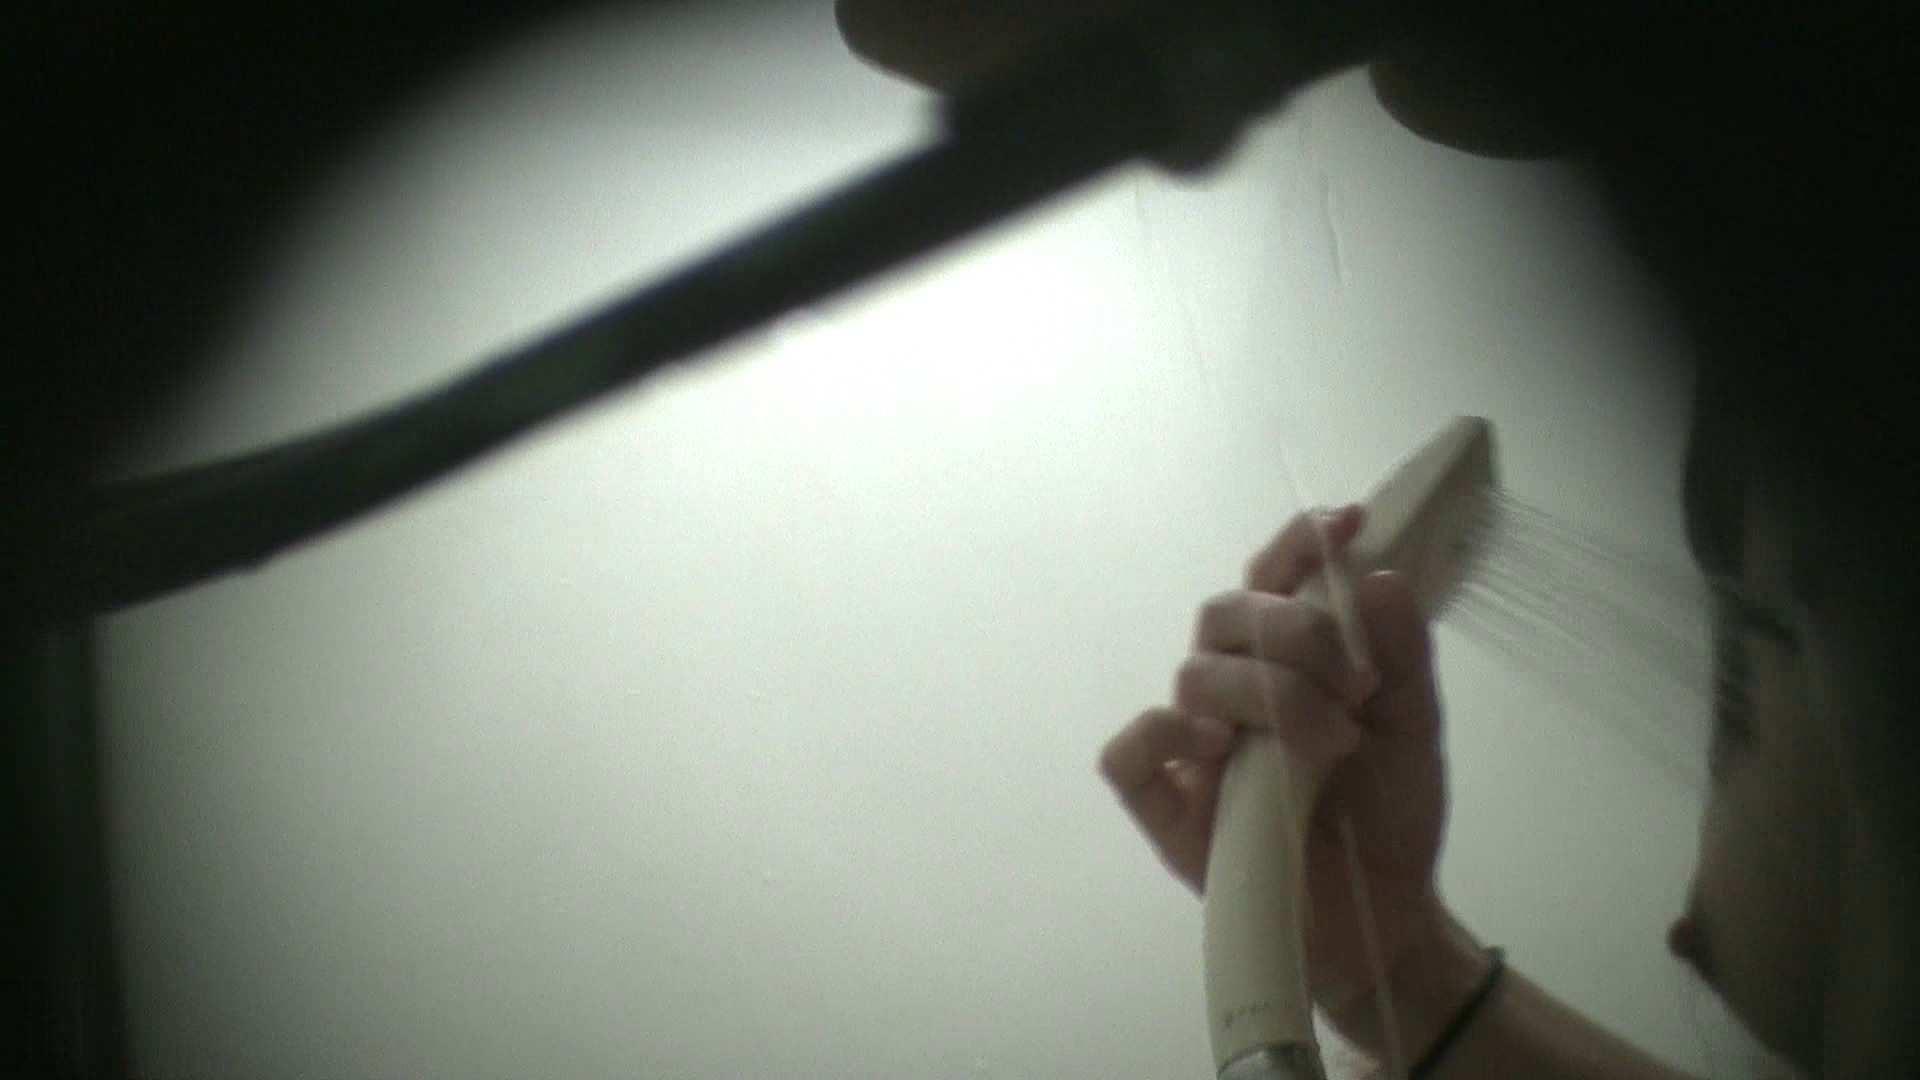 NO.22 何をニヤニヤしているのやら【MKB10位】 シャワー室 オマンコ無修正動画無料 71画像 30